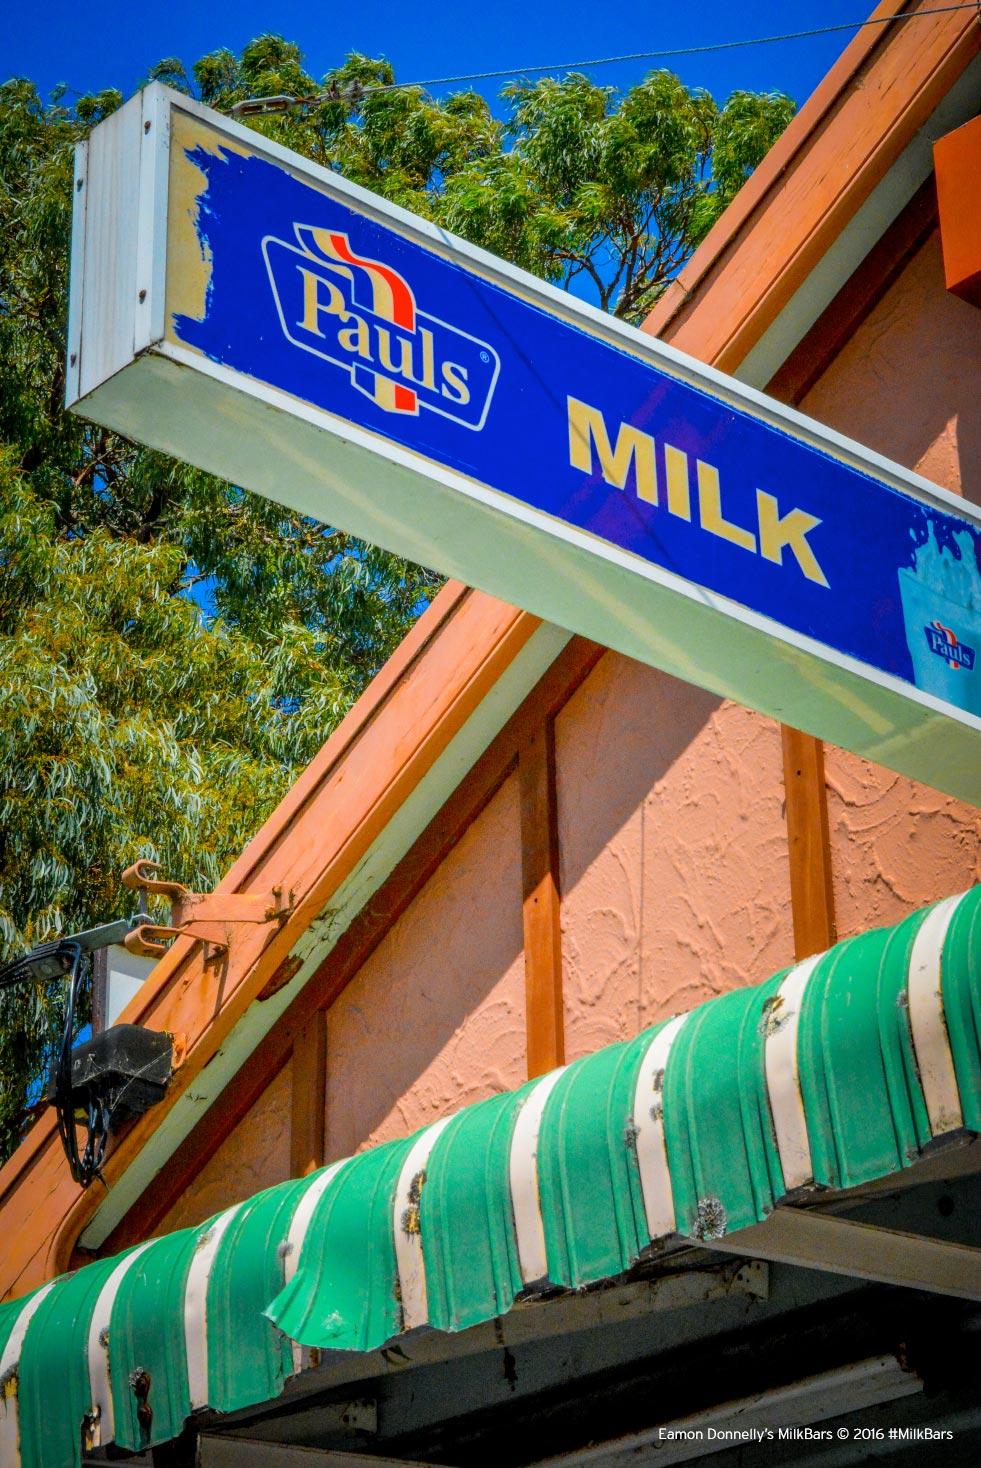 Pauls-Milk-Bar-Eamon-Donnelly's-Milk-Bars-Book-Project-(c)-2001-2016.jpg